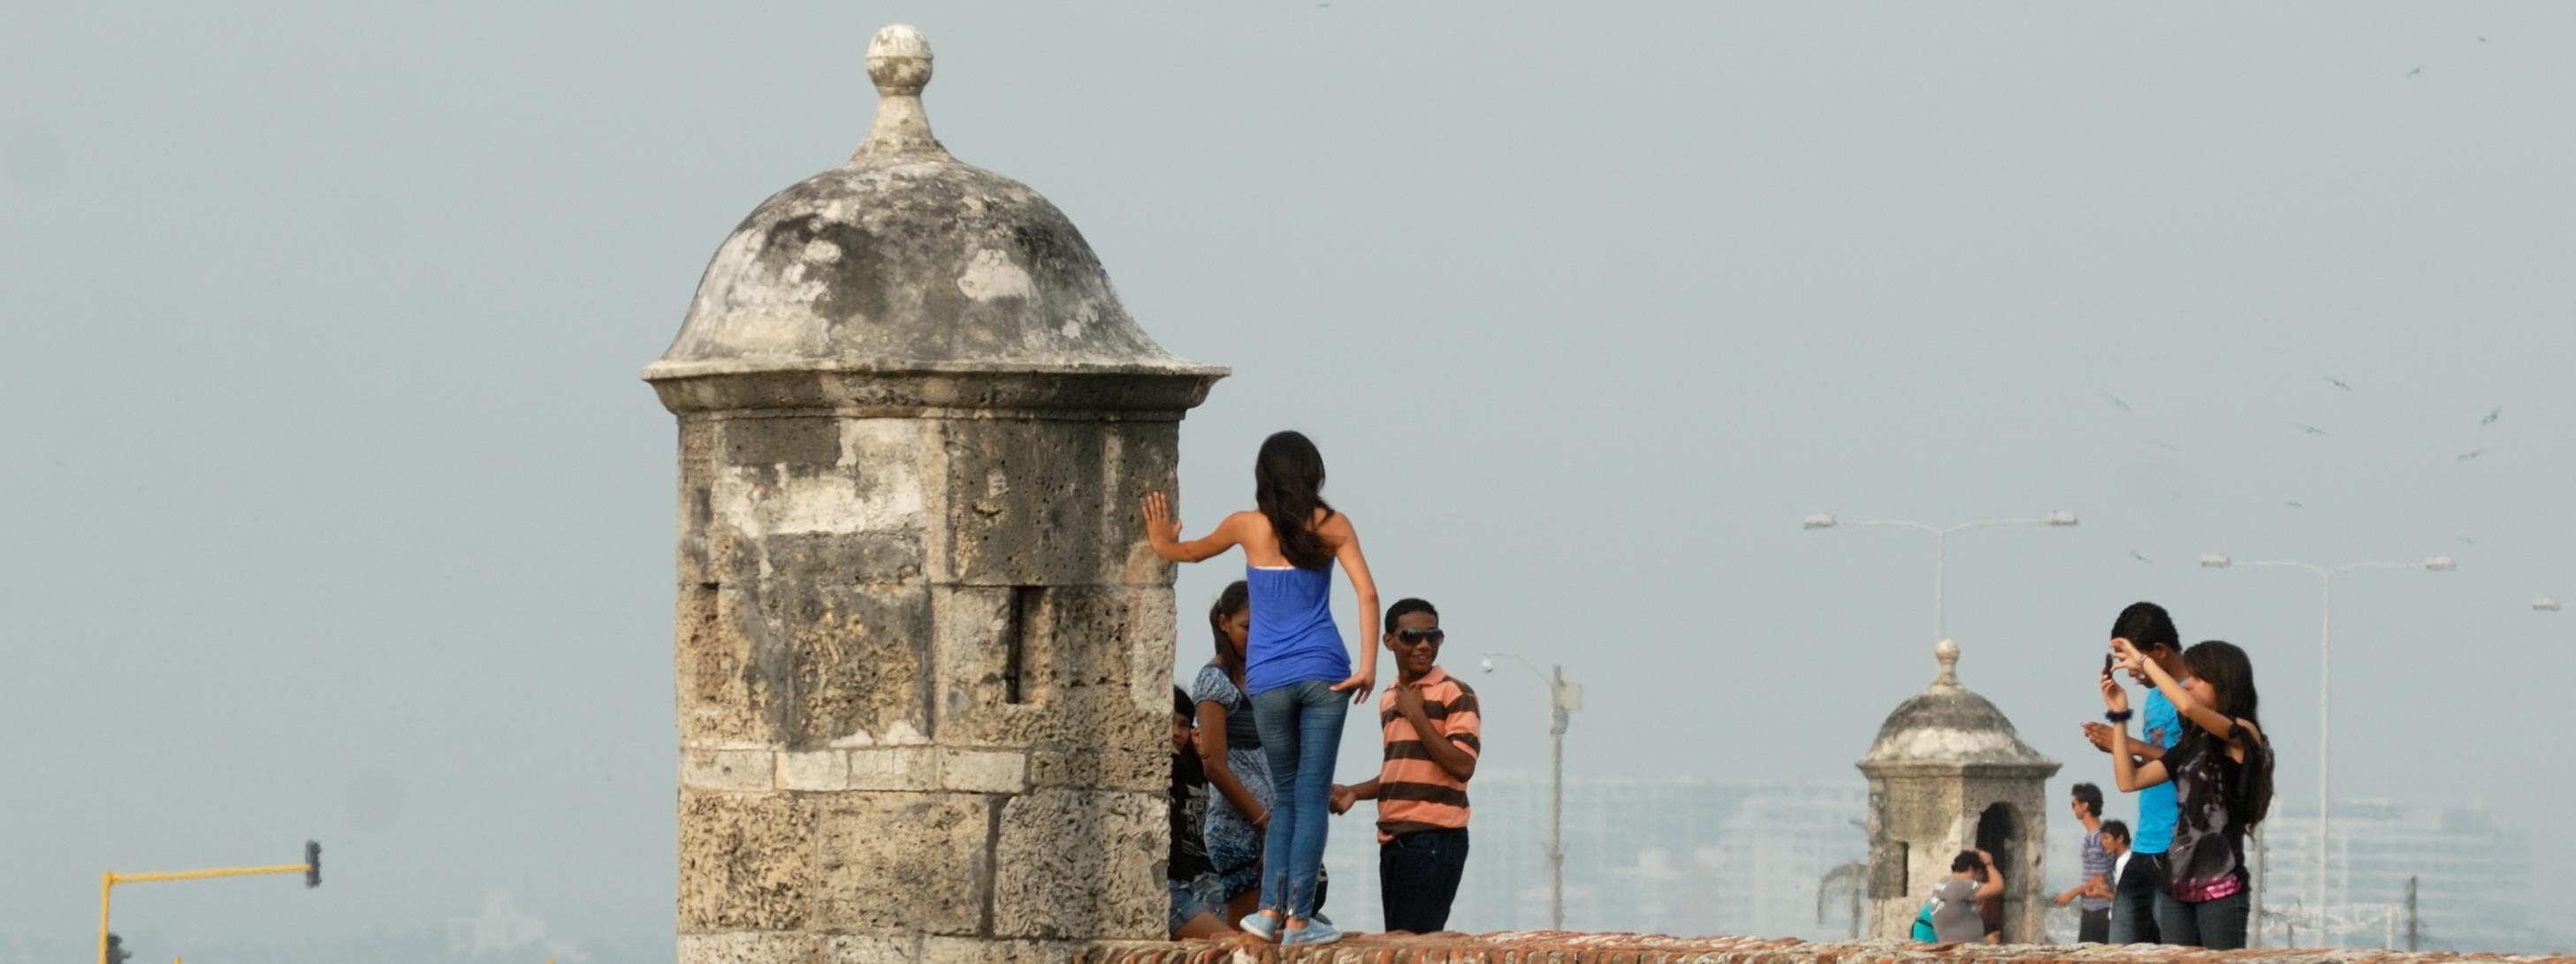 http://www.kontour-travel.com/wp-content/uploads/cartagena-muralla.jpg